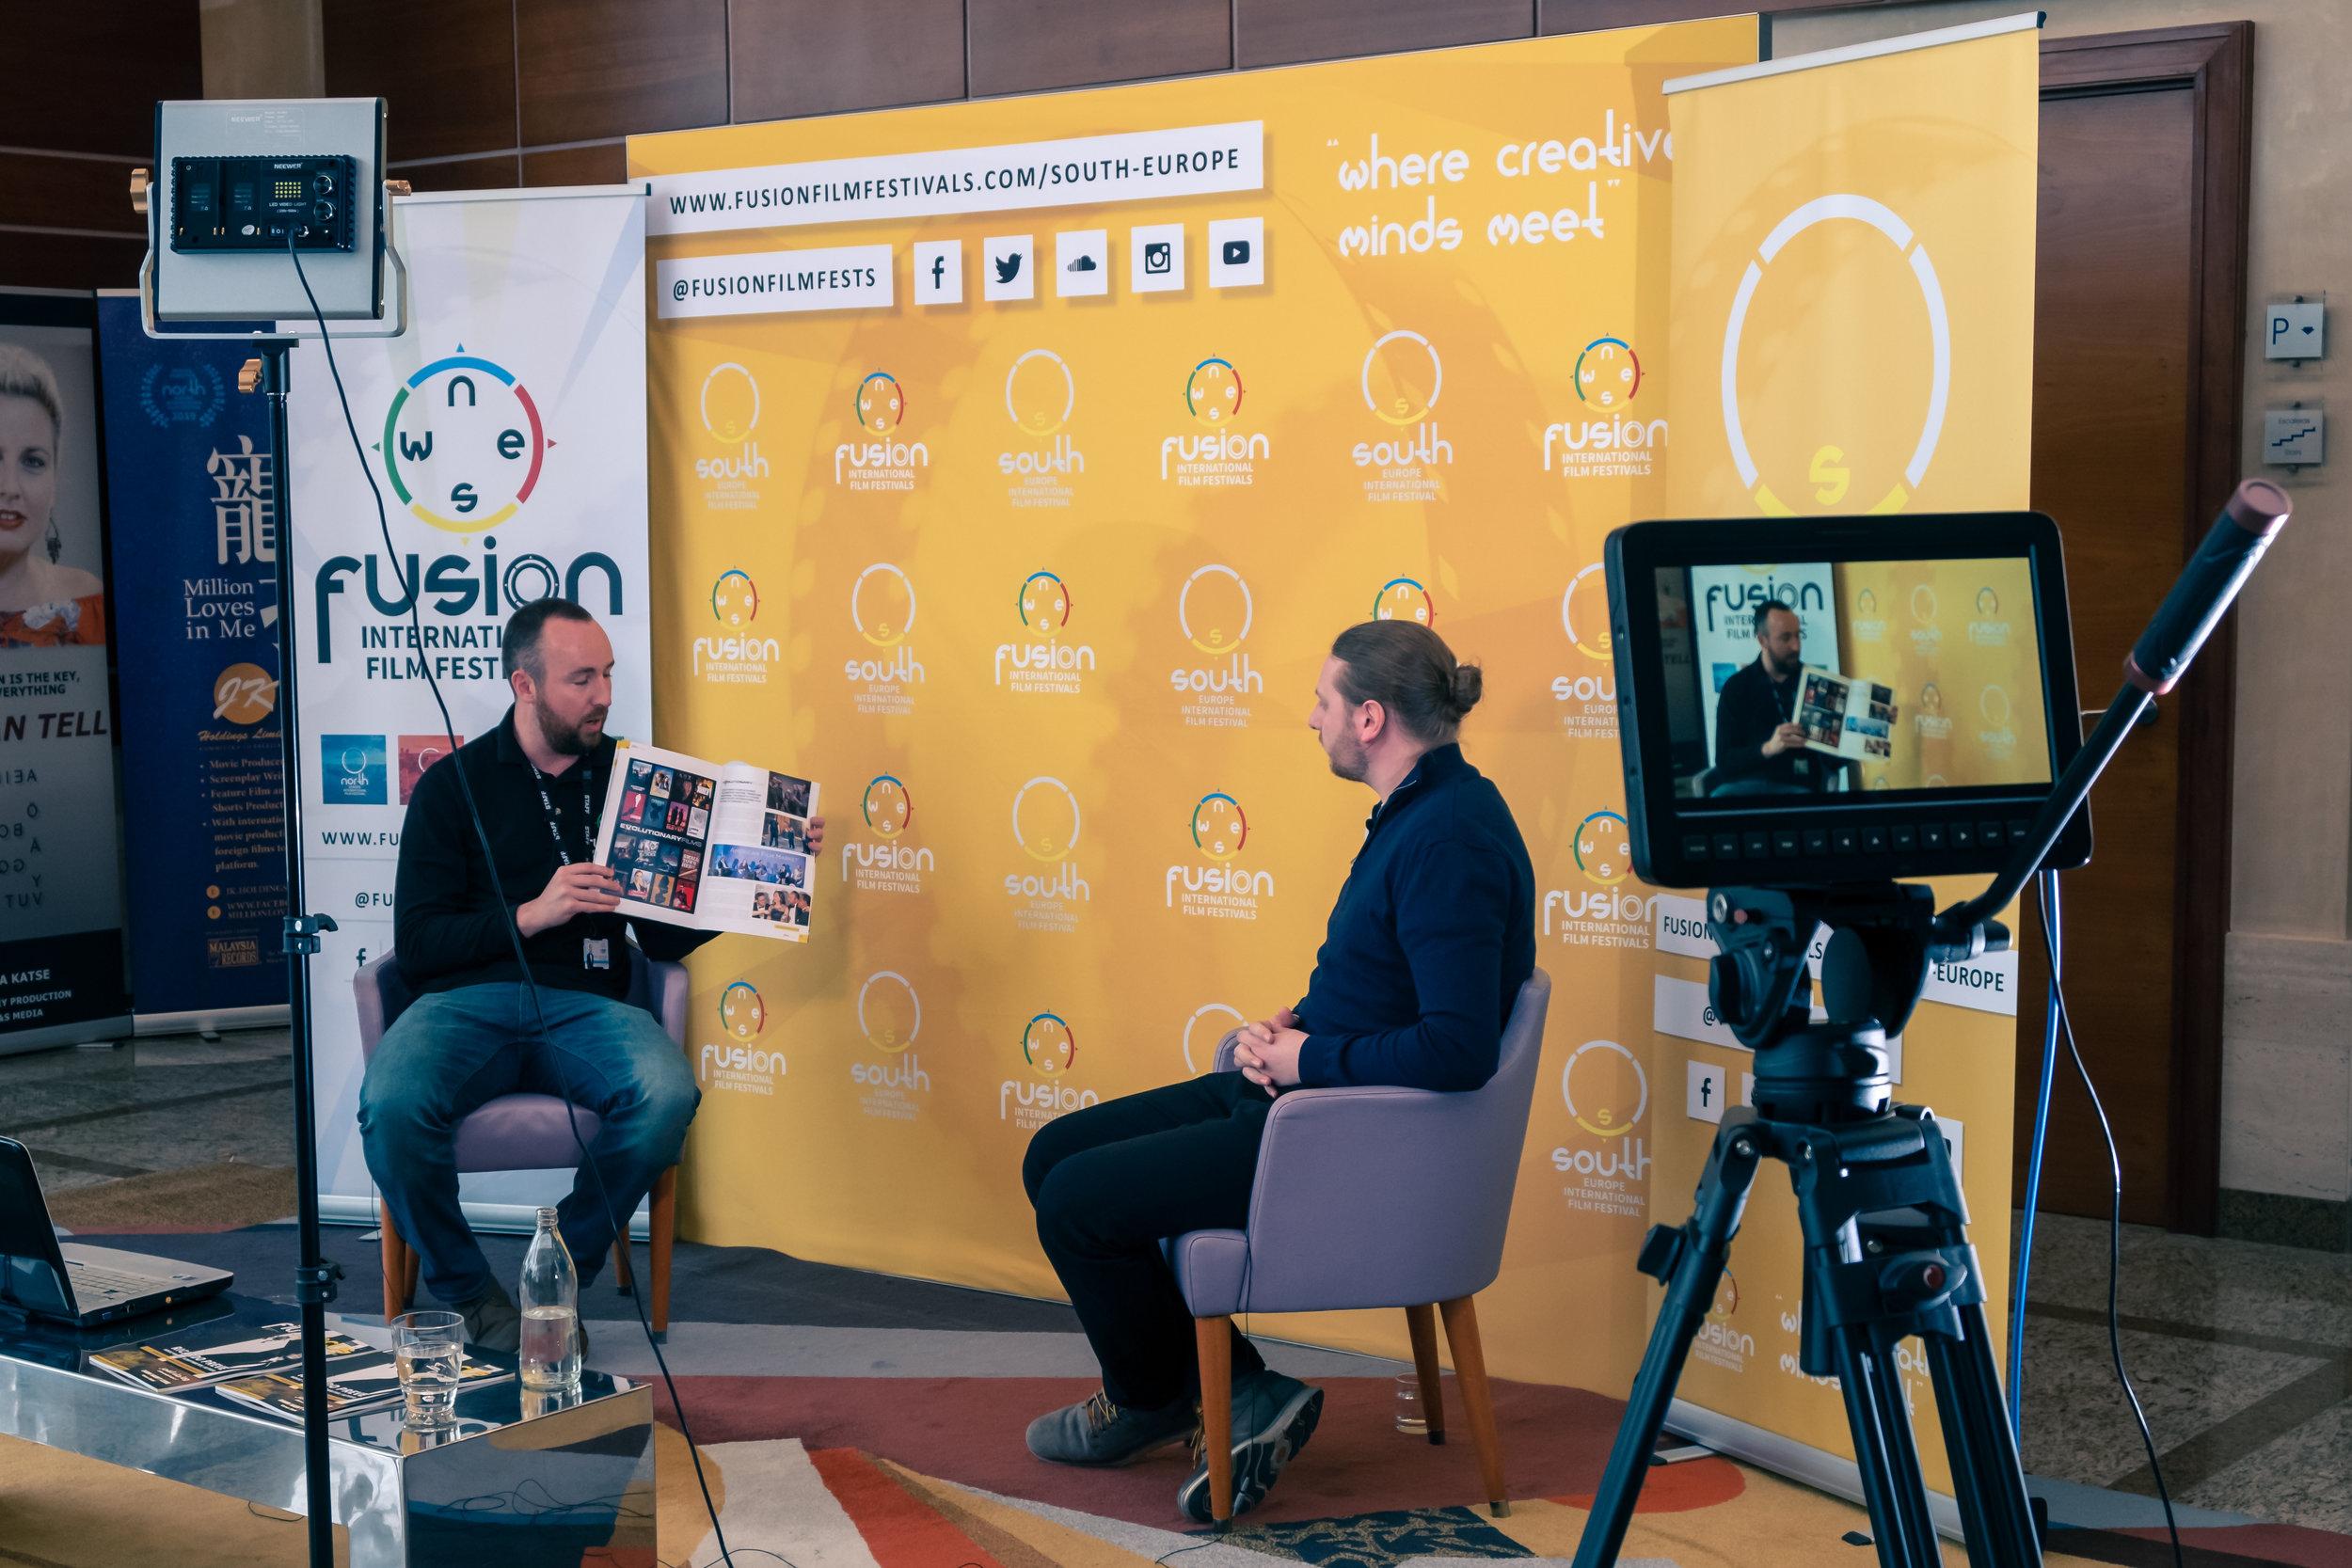 Dan Hickford and Joseph Piddington at the South Europe International Film Festival in Valencia on May 9, 2019    Courtesy of Stuart Watson